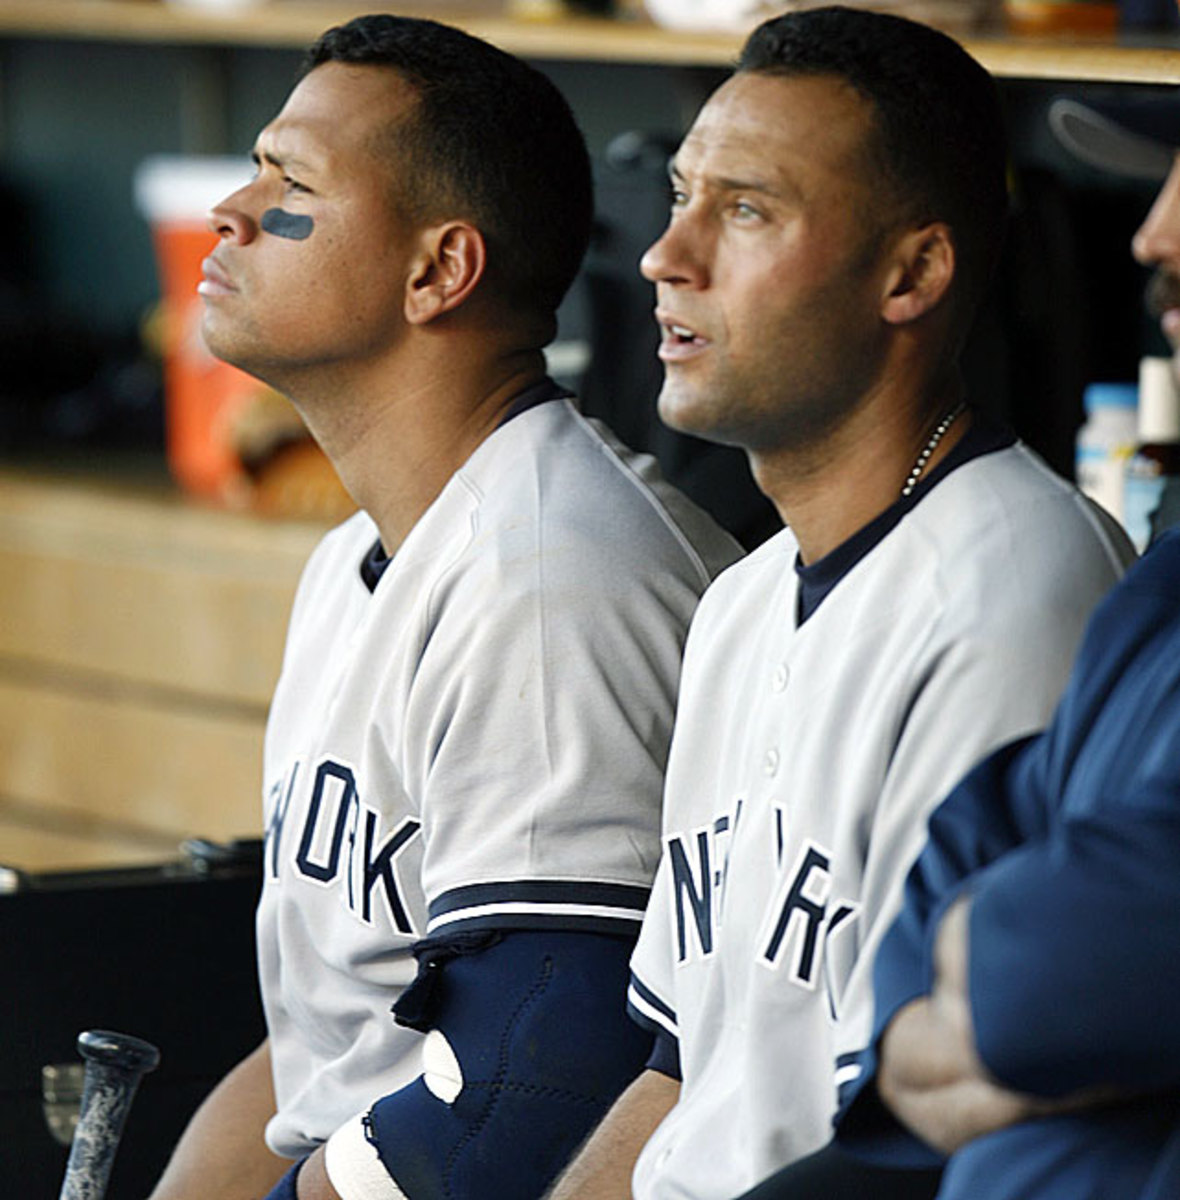 2006 New York Yankees (97-65)